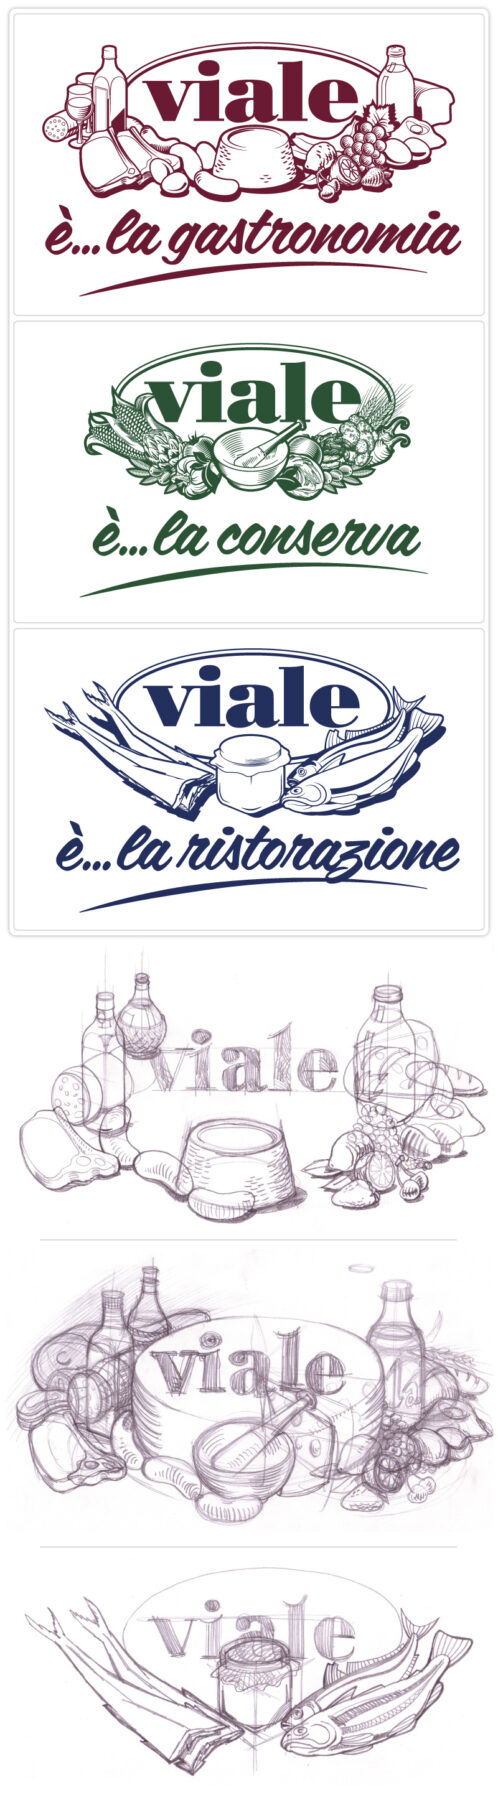 Viale gastronomia logo